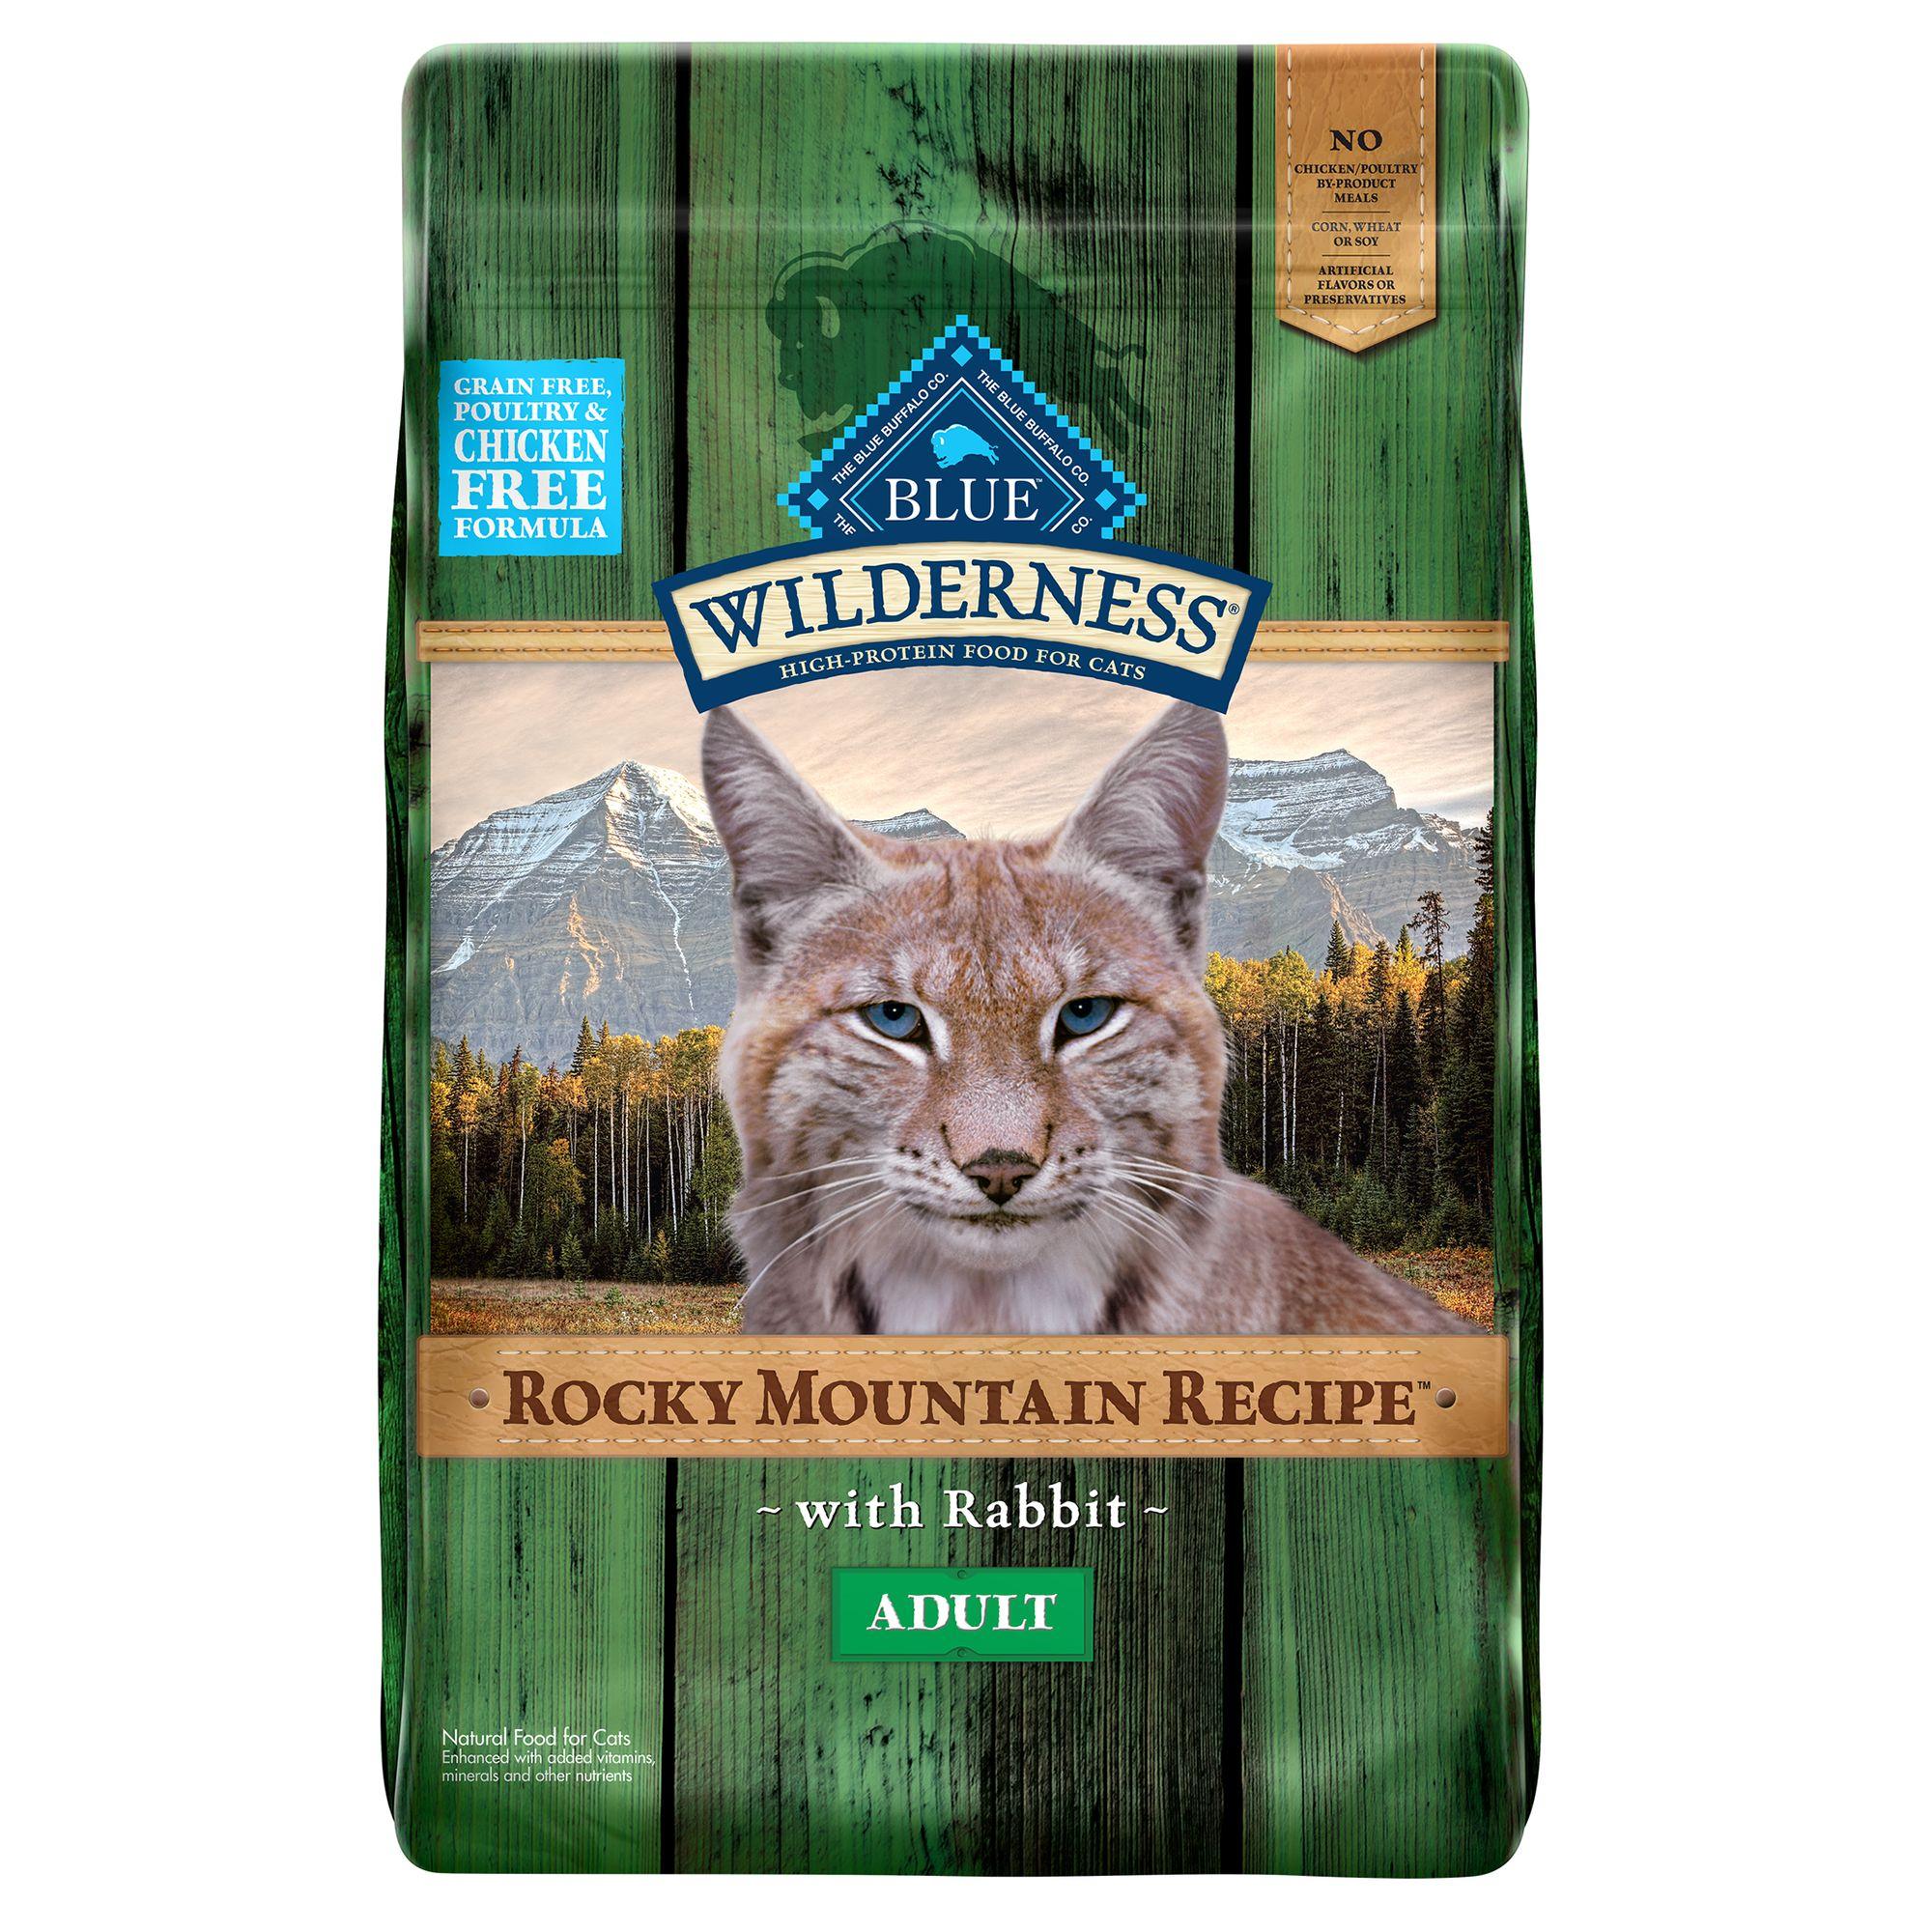 Blue Wilderness Rocky Mountain Recipe, Grain Free Rabbit Adult Cat Food size: 10 Lb, Blue Buffalo